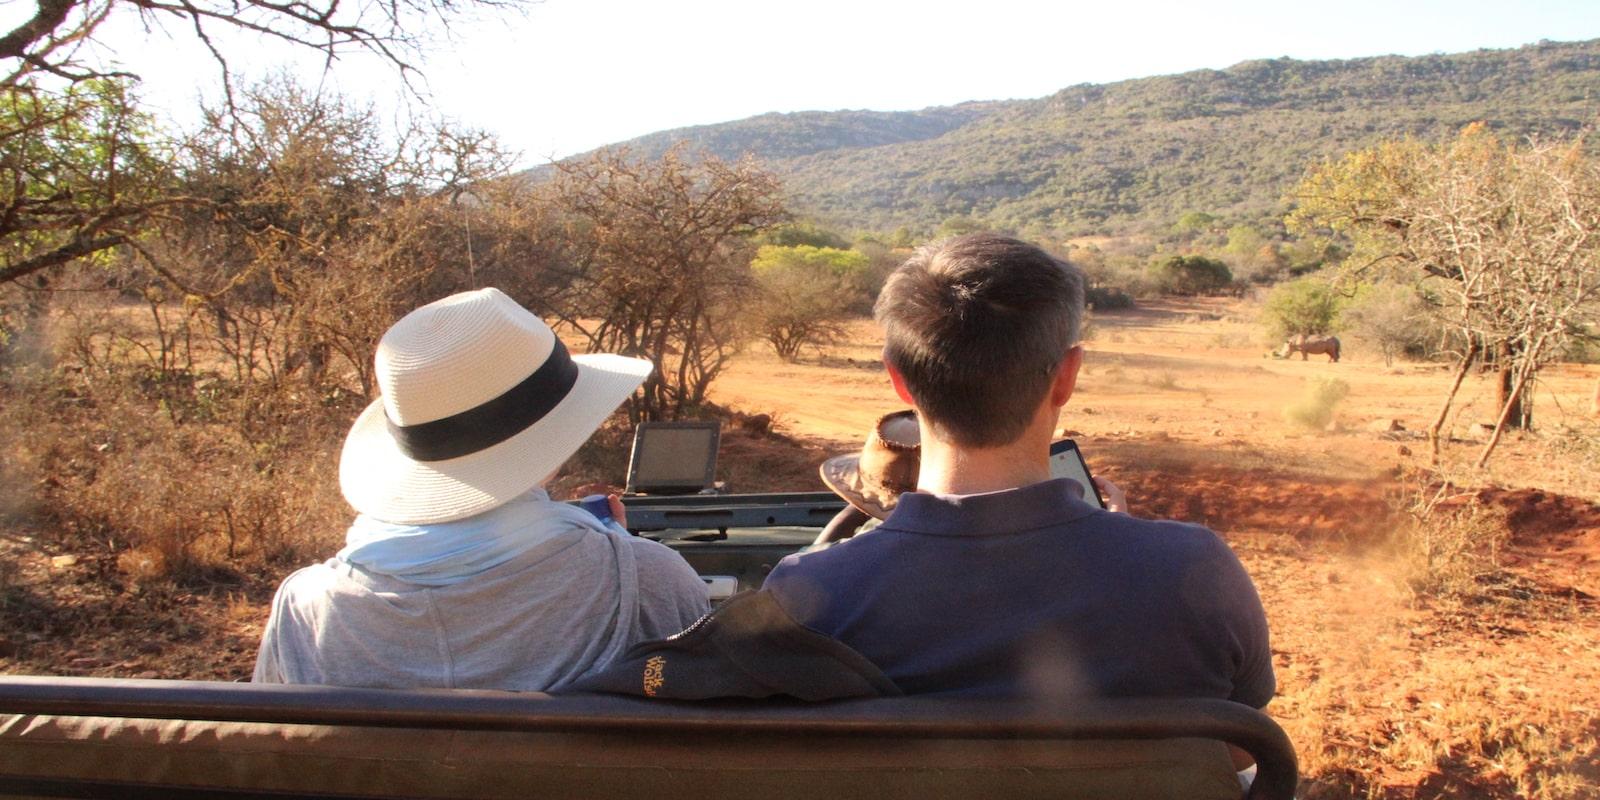 Safari on the road